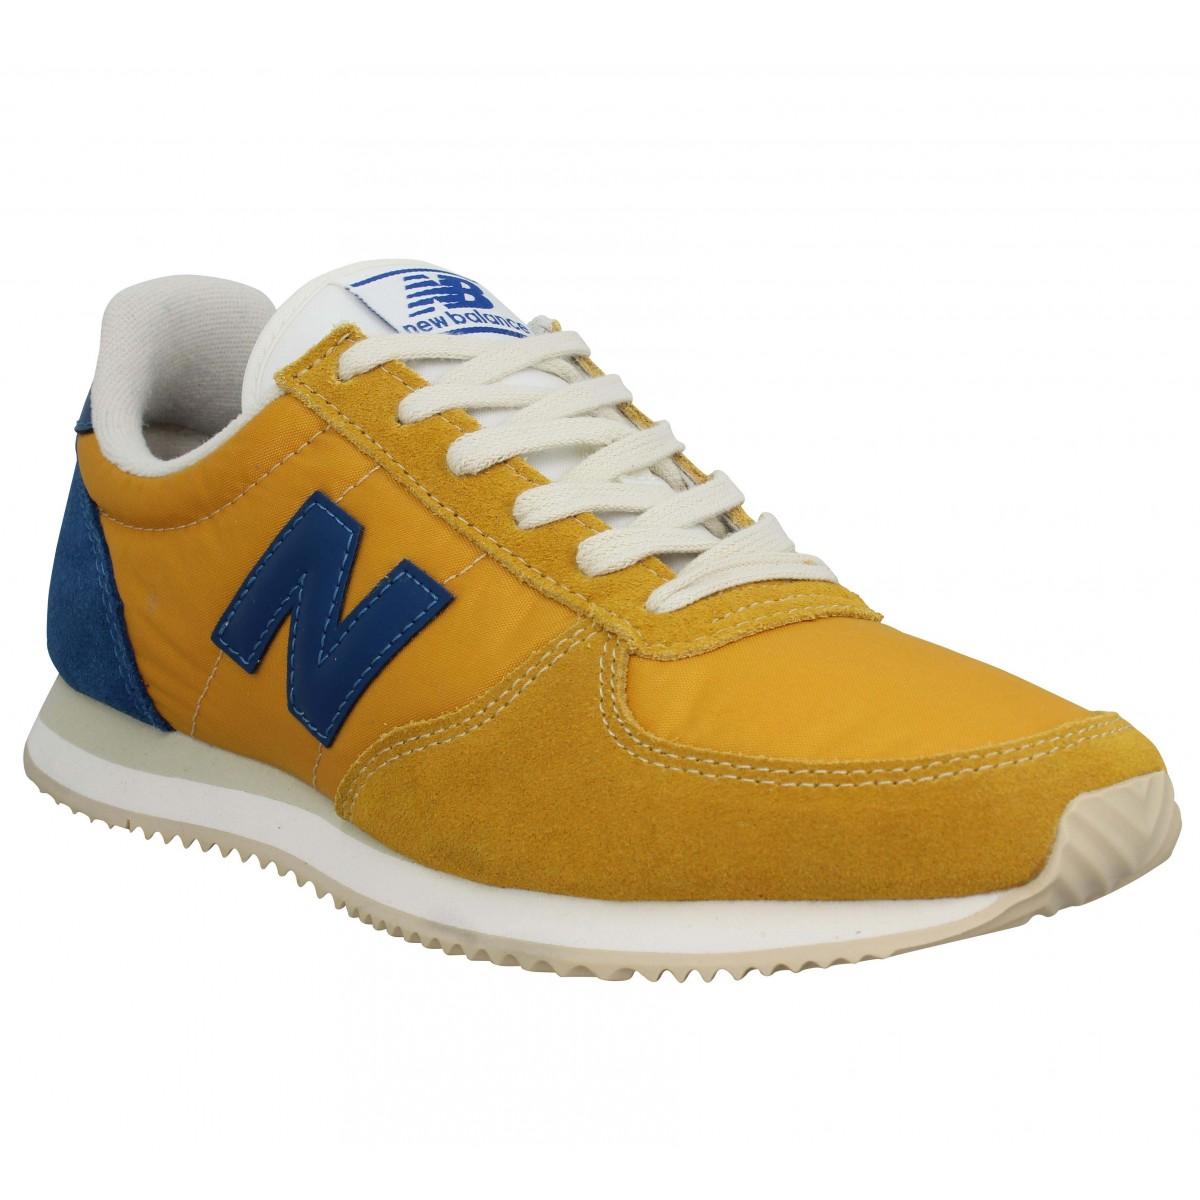 New Balance Homme 220 Toile -40-jaune